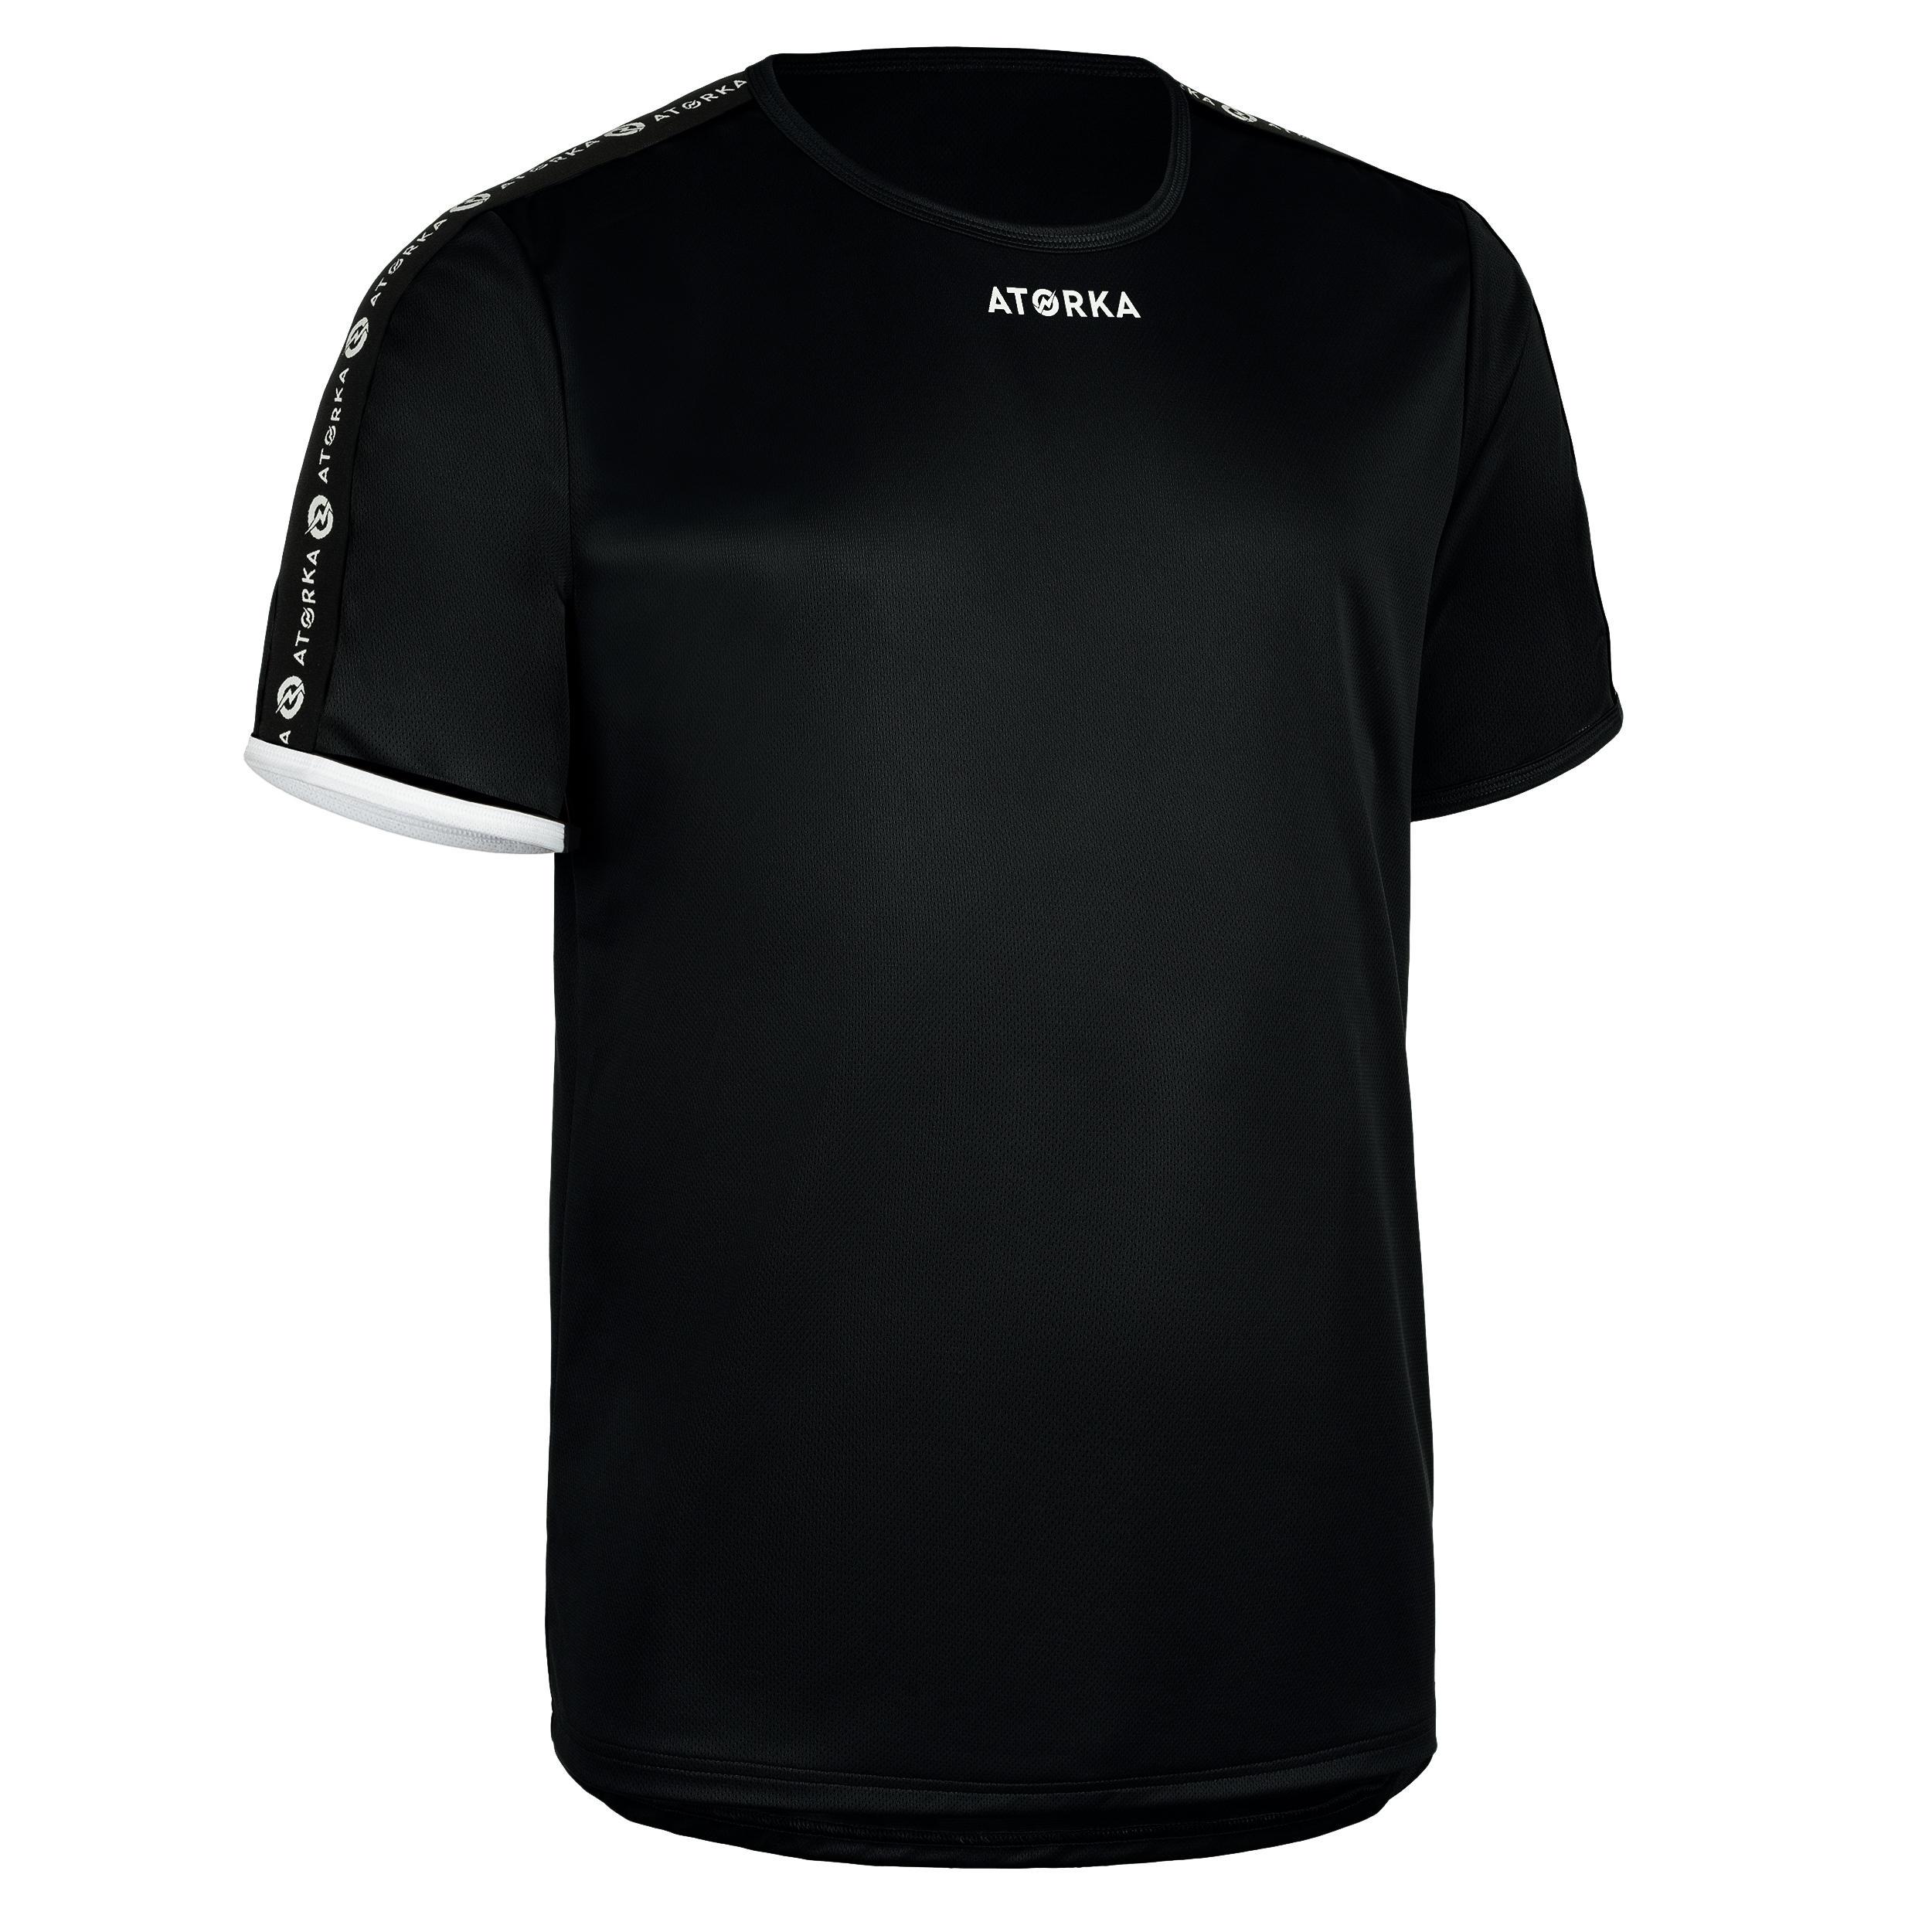 Tricou H100C negru bărbați la Reducere poza